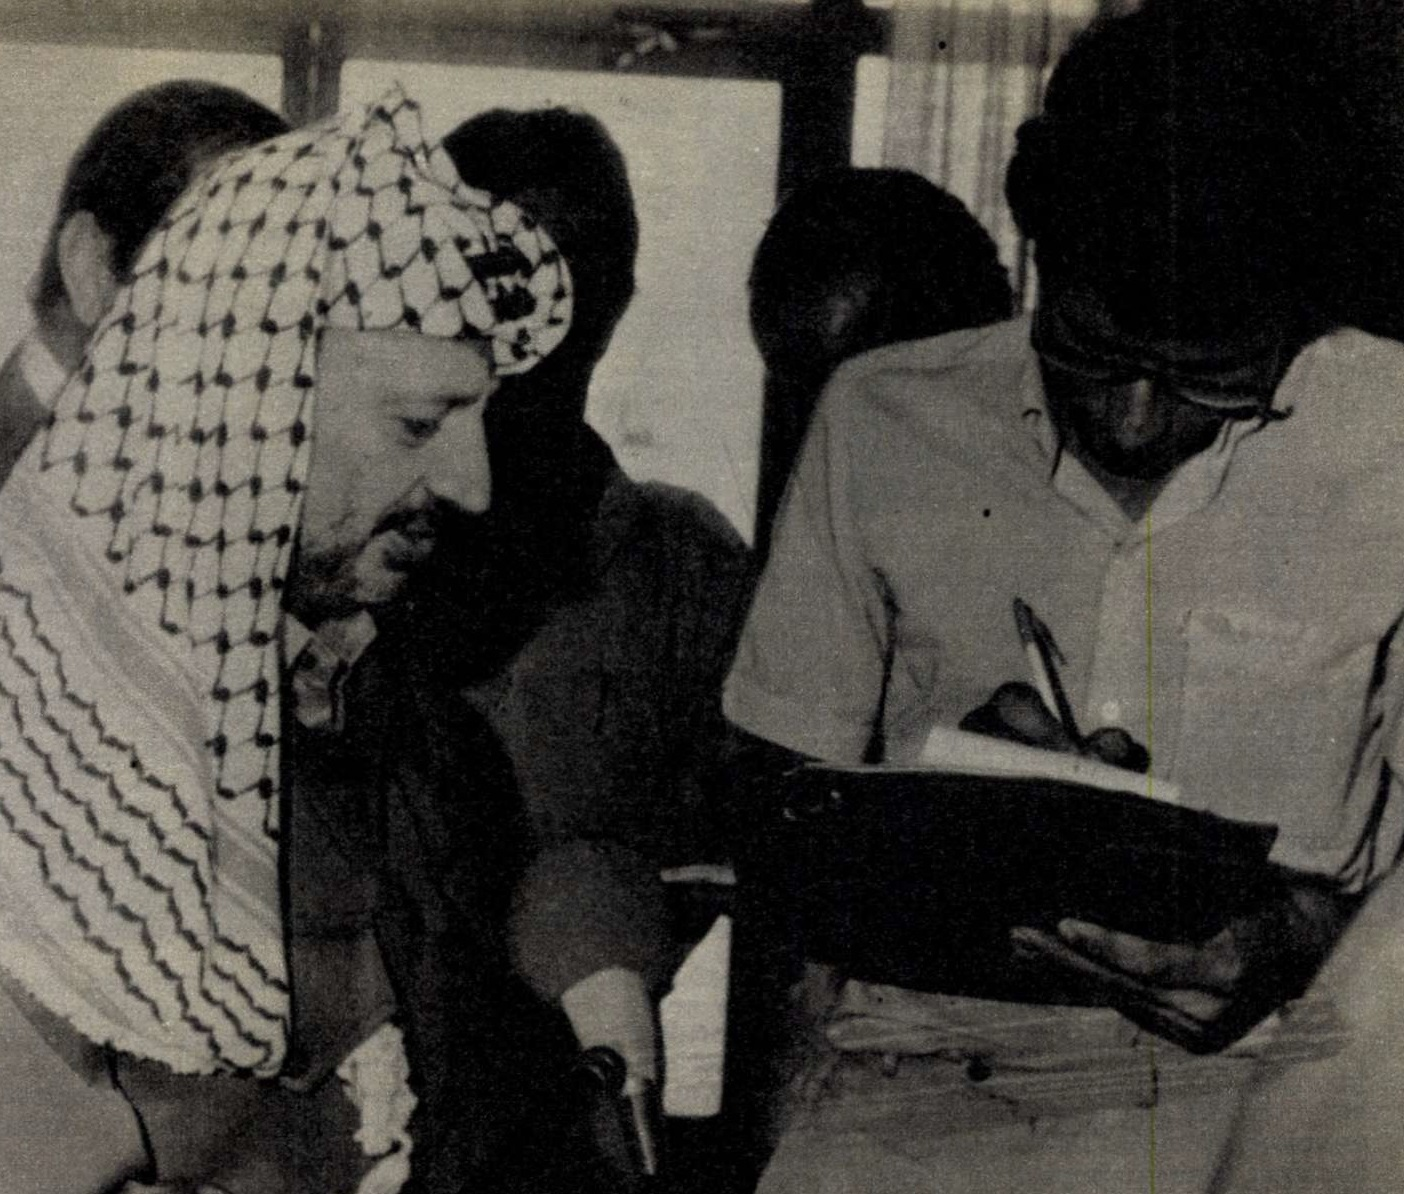 idokapszula_nb_i_1983_84_bevezetes_i_arafat.jpg